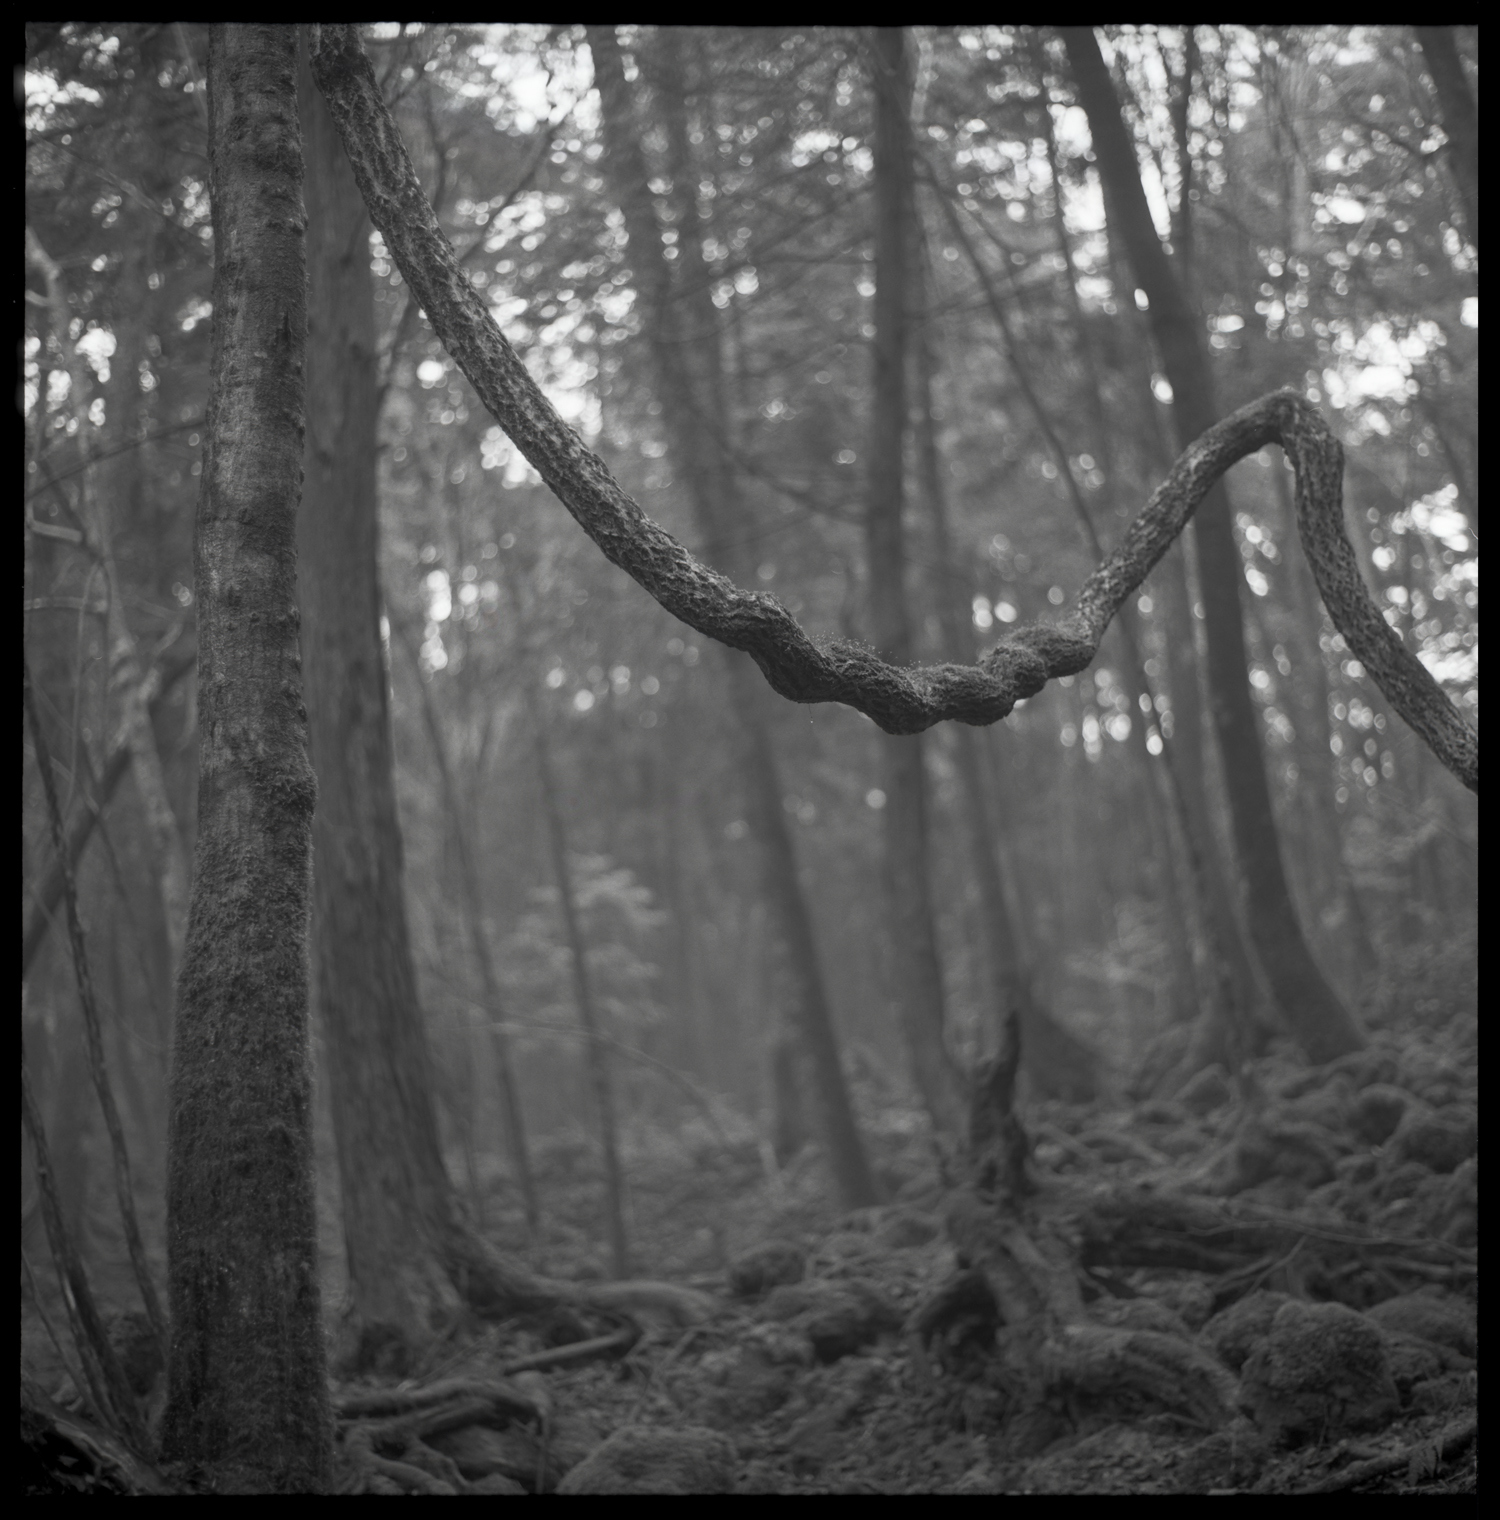 forest-bw-16.jpg